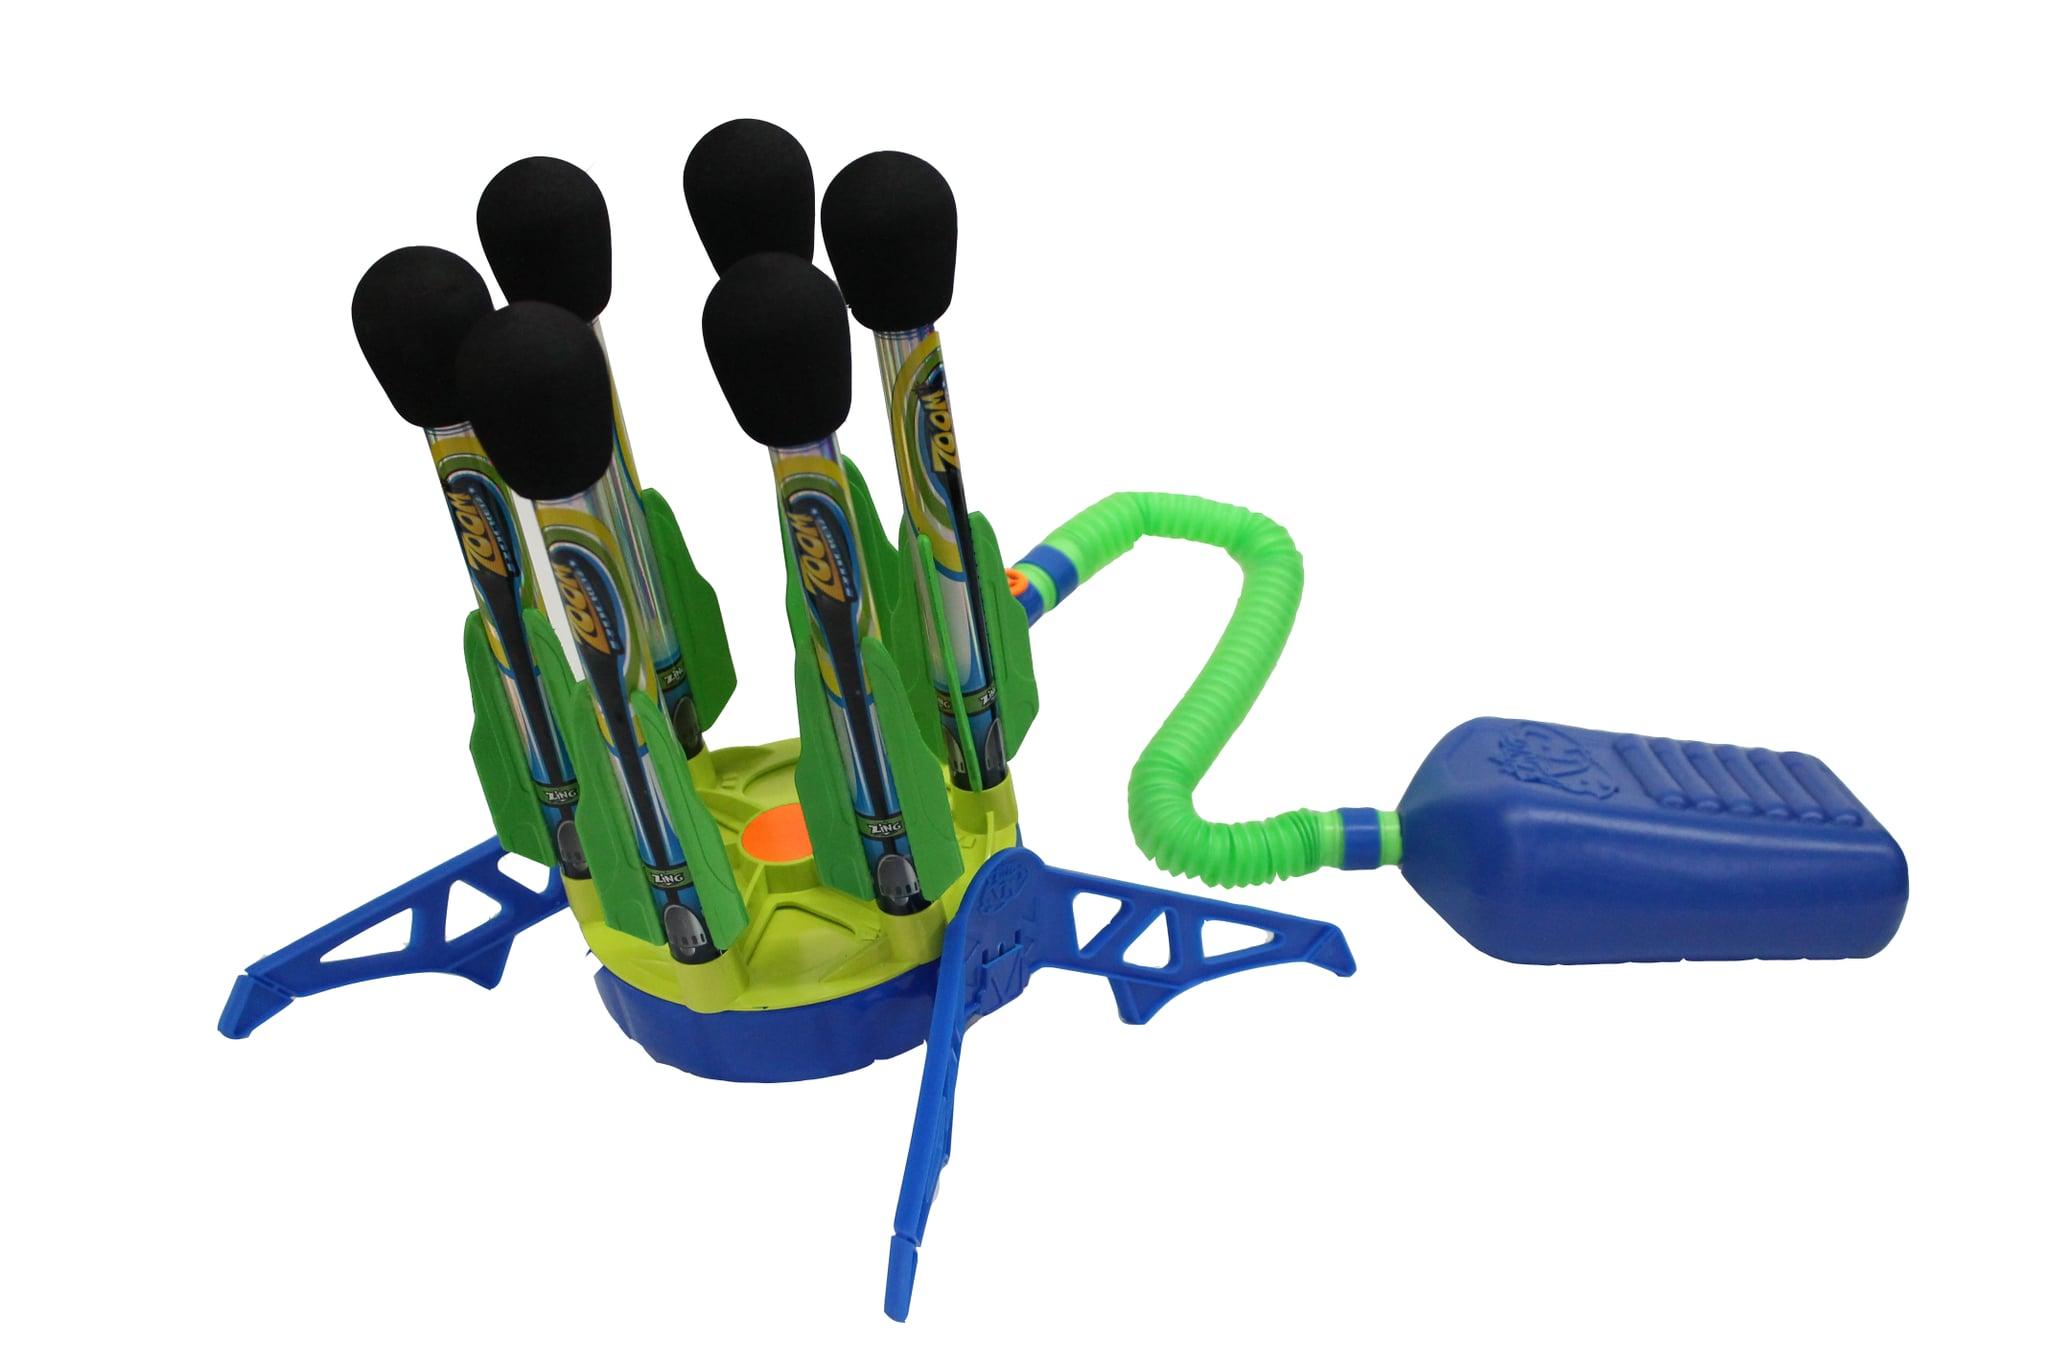 Zing Toys X6 Zoom Rocket